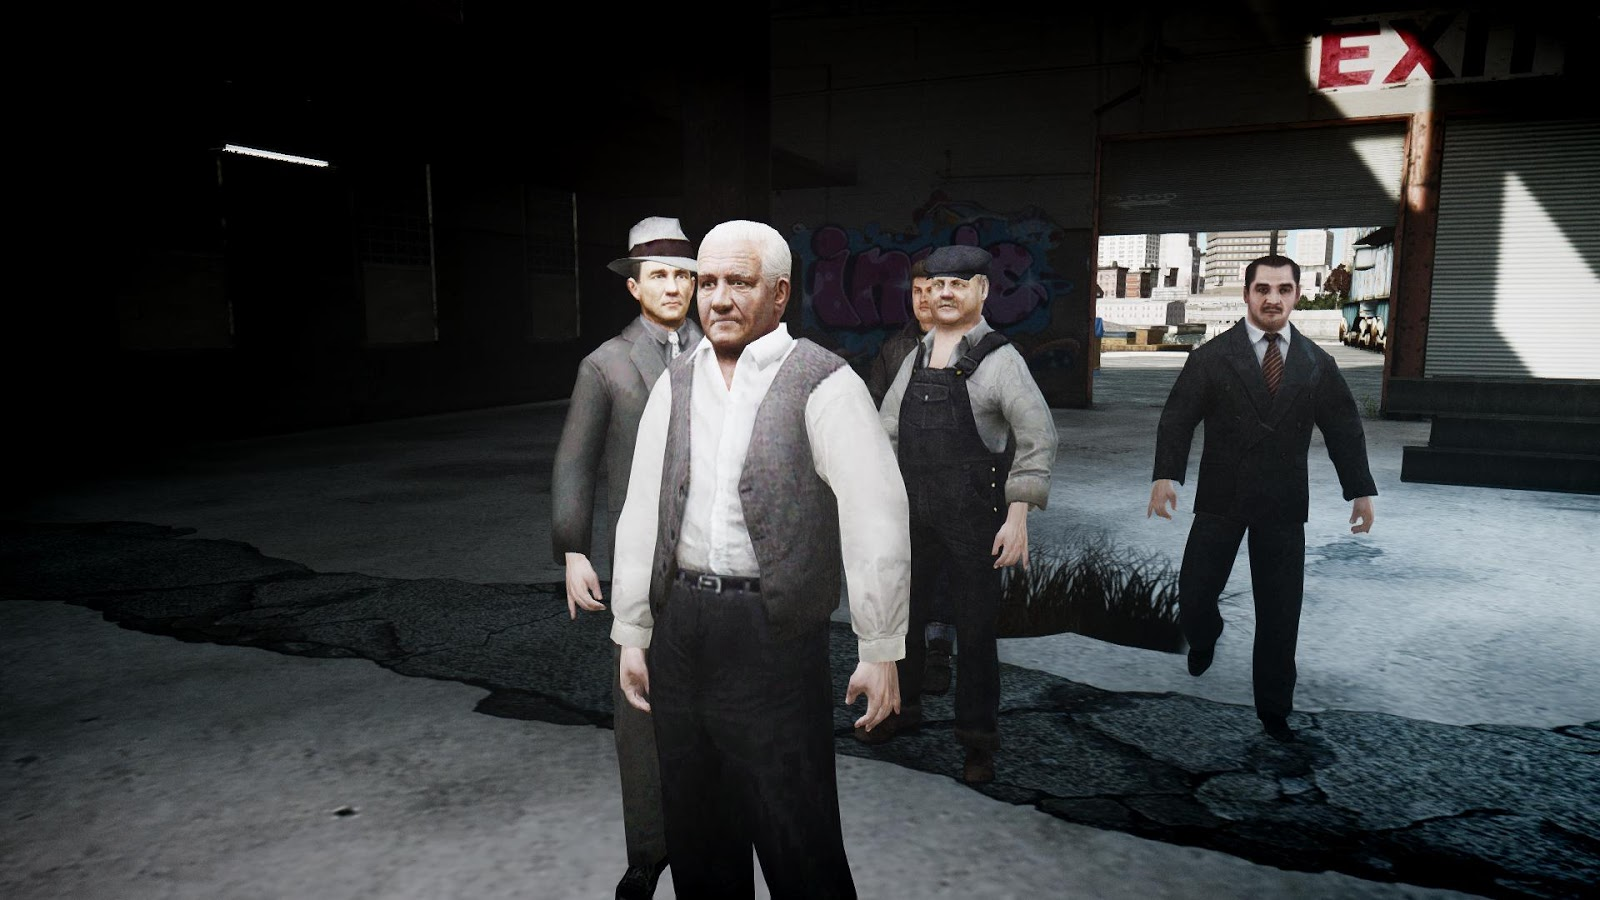 GTA 5,GTAV,GTA IV Mods and Skins: Mafia 2 Peds Part 1